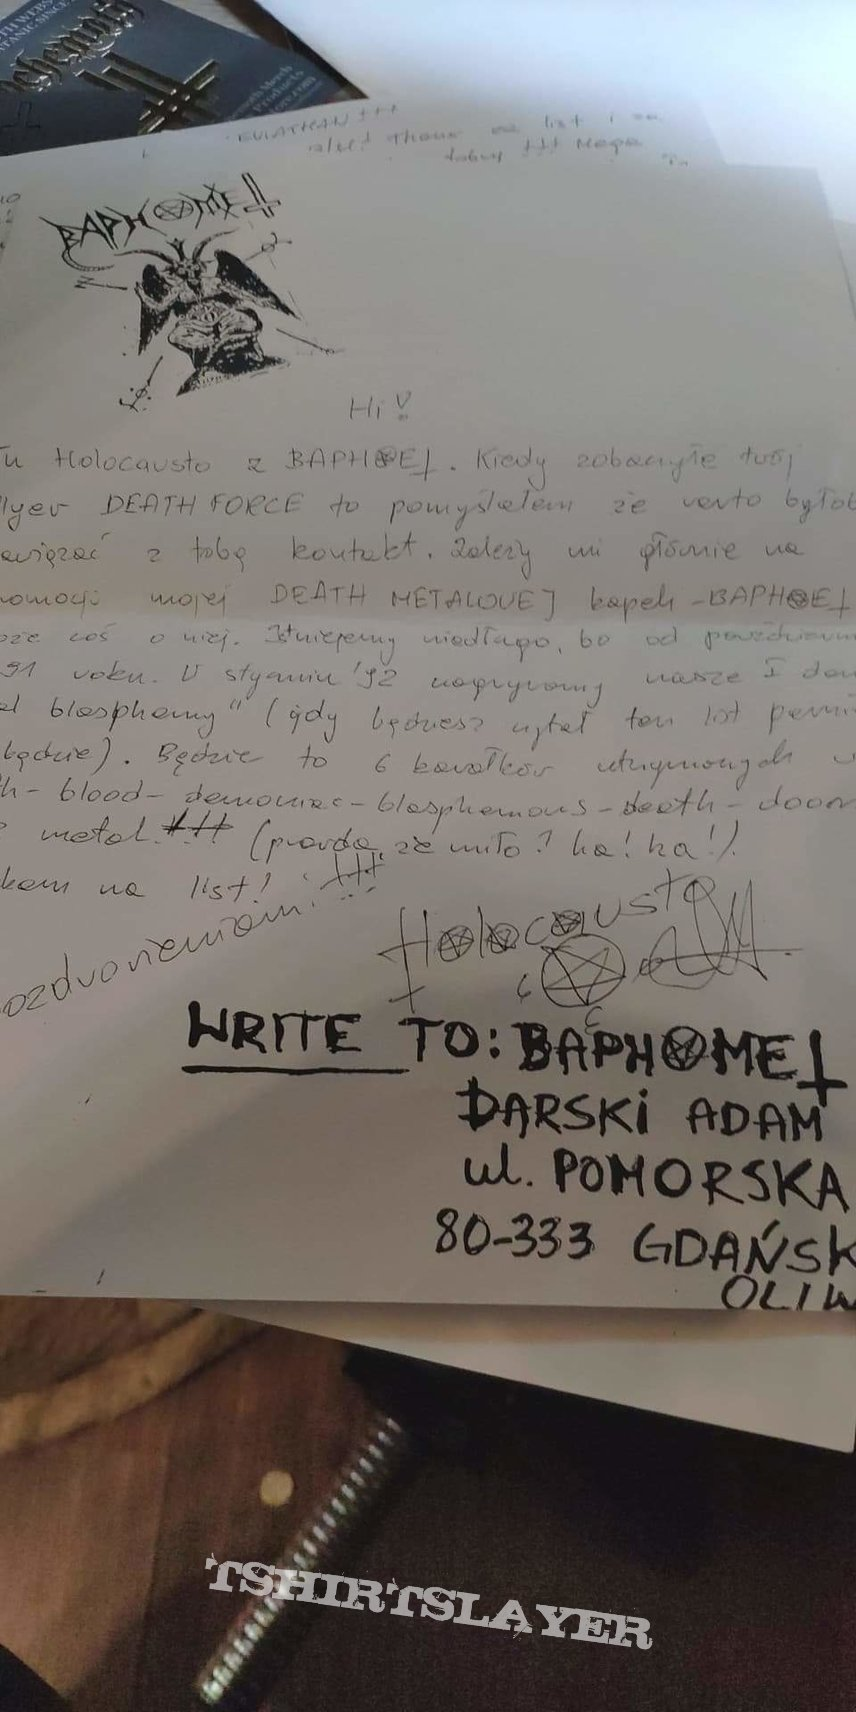 Behemoth - copy of Nergal letter (as Holocausto, band Baphomet)